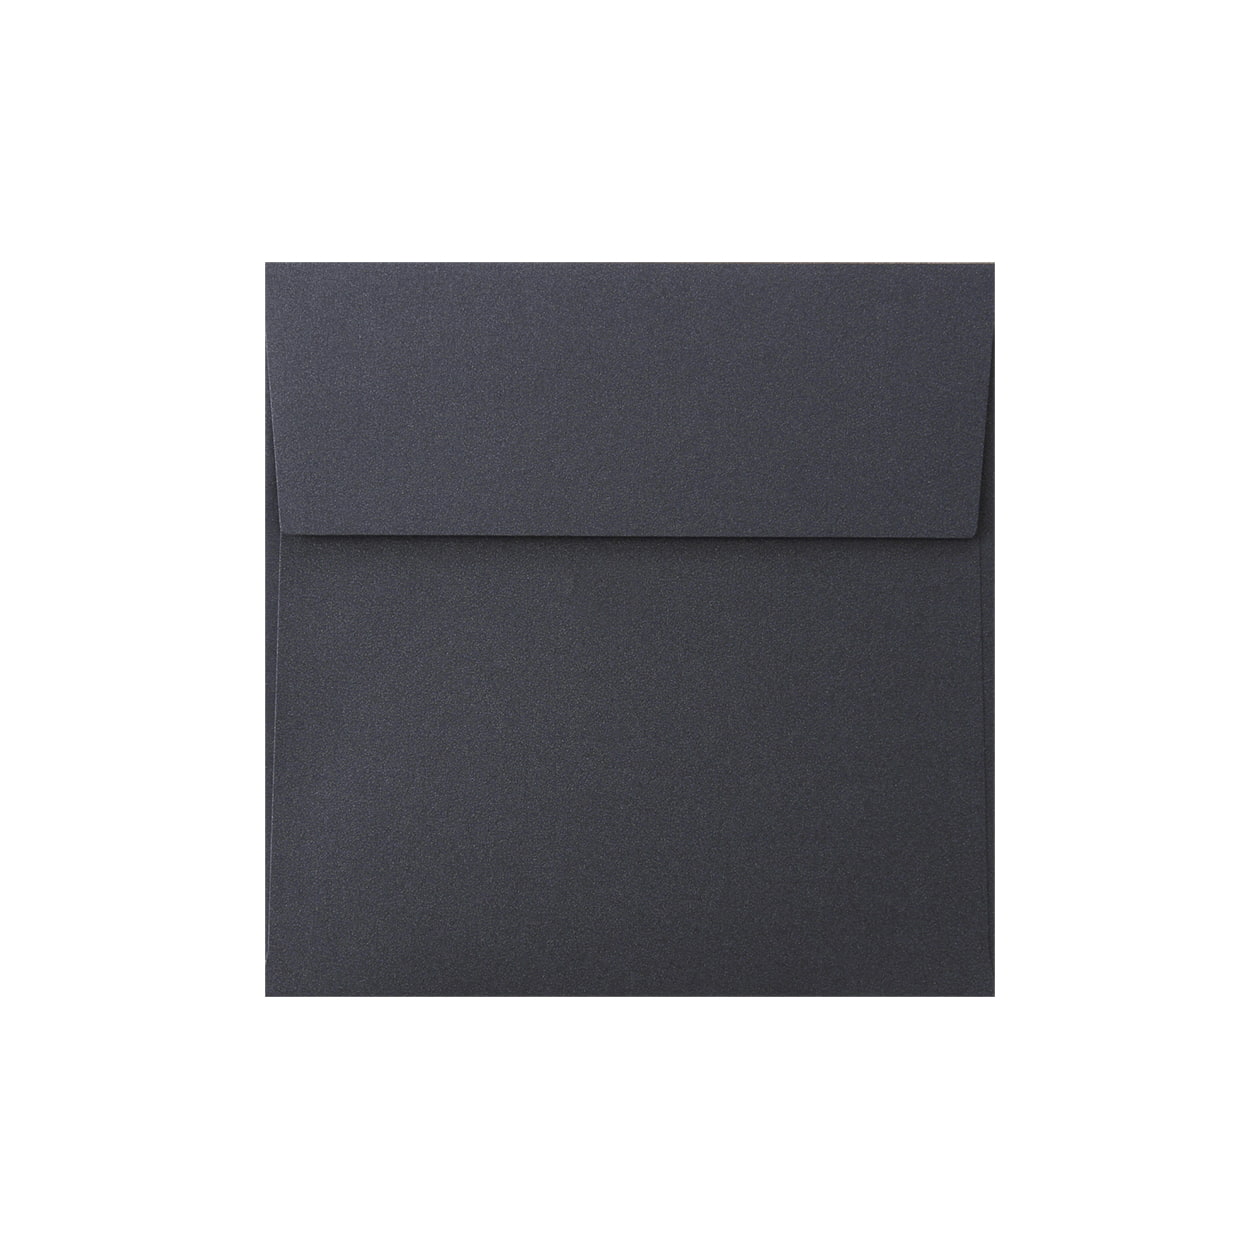 SE16カマス封筒 コットンパール ミッドナイトブルー 125.3g